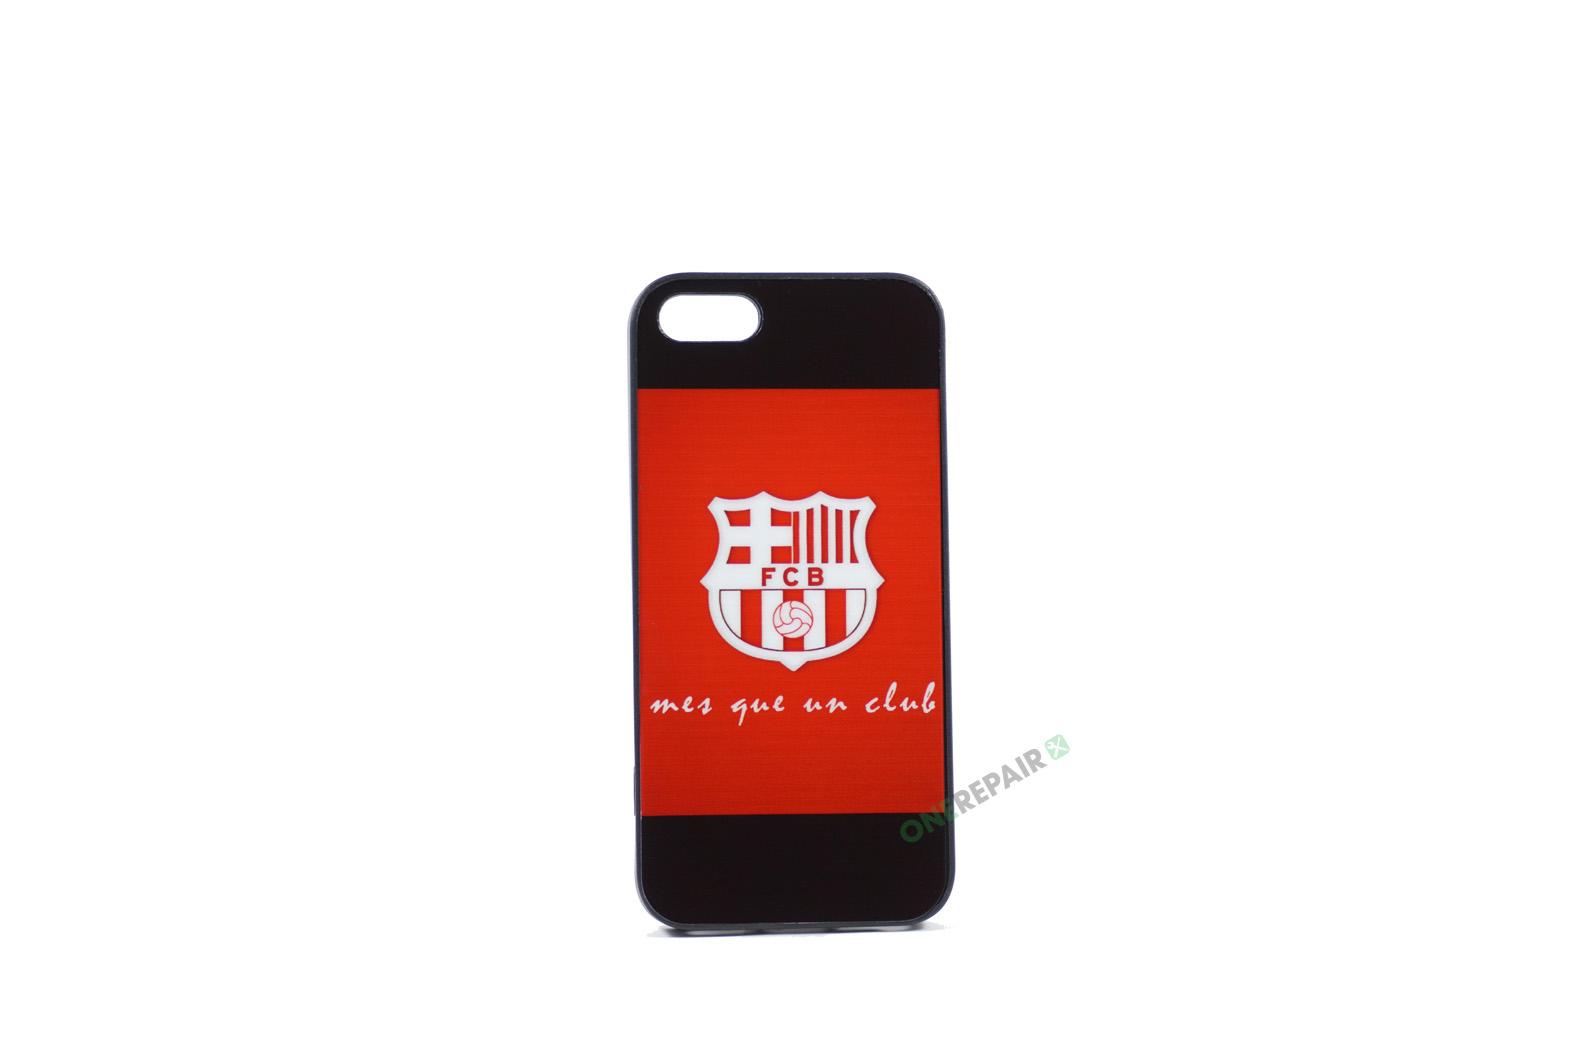 Billig iPhone 5 5S SE Cover Bagcover Gummicover A1453 A1457 A1518 A1528 A1530 A1533 A1428 A1429 A1442 A1723 A1662 A1724 FC Barcelona FCB Fodbold Klub